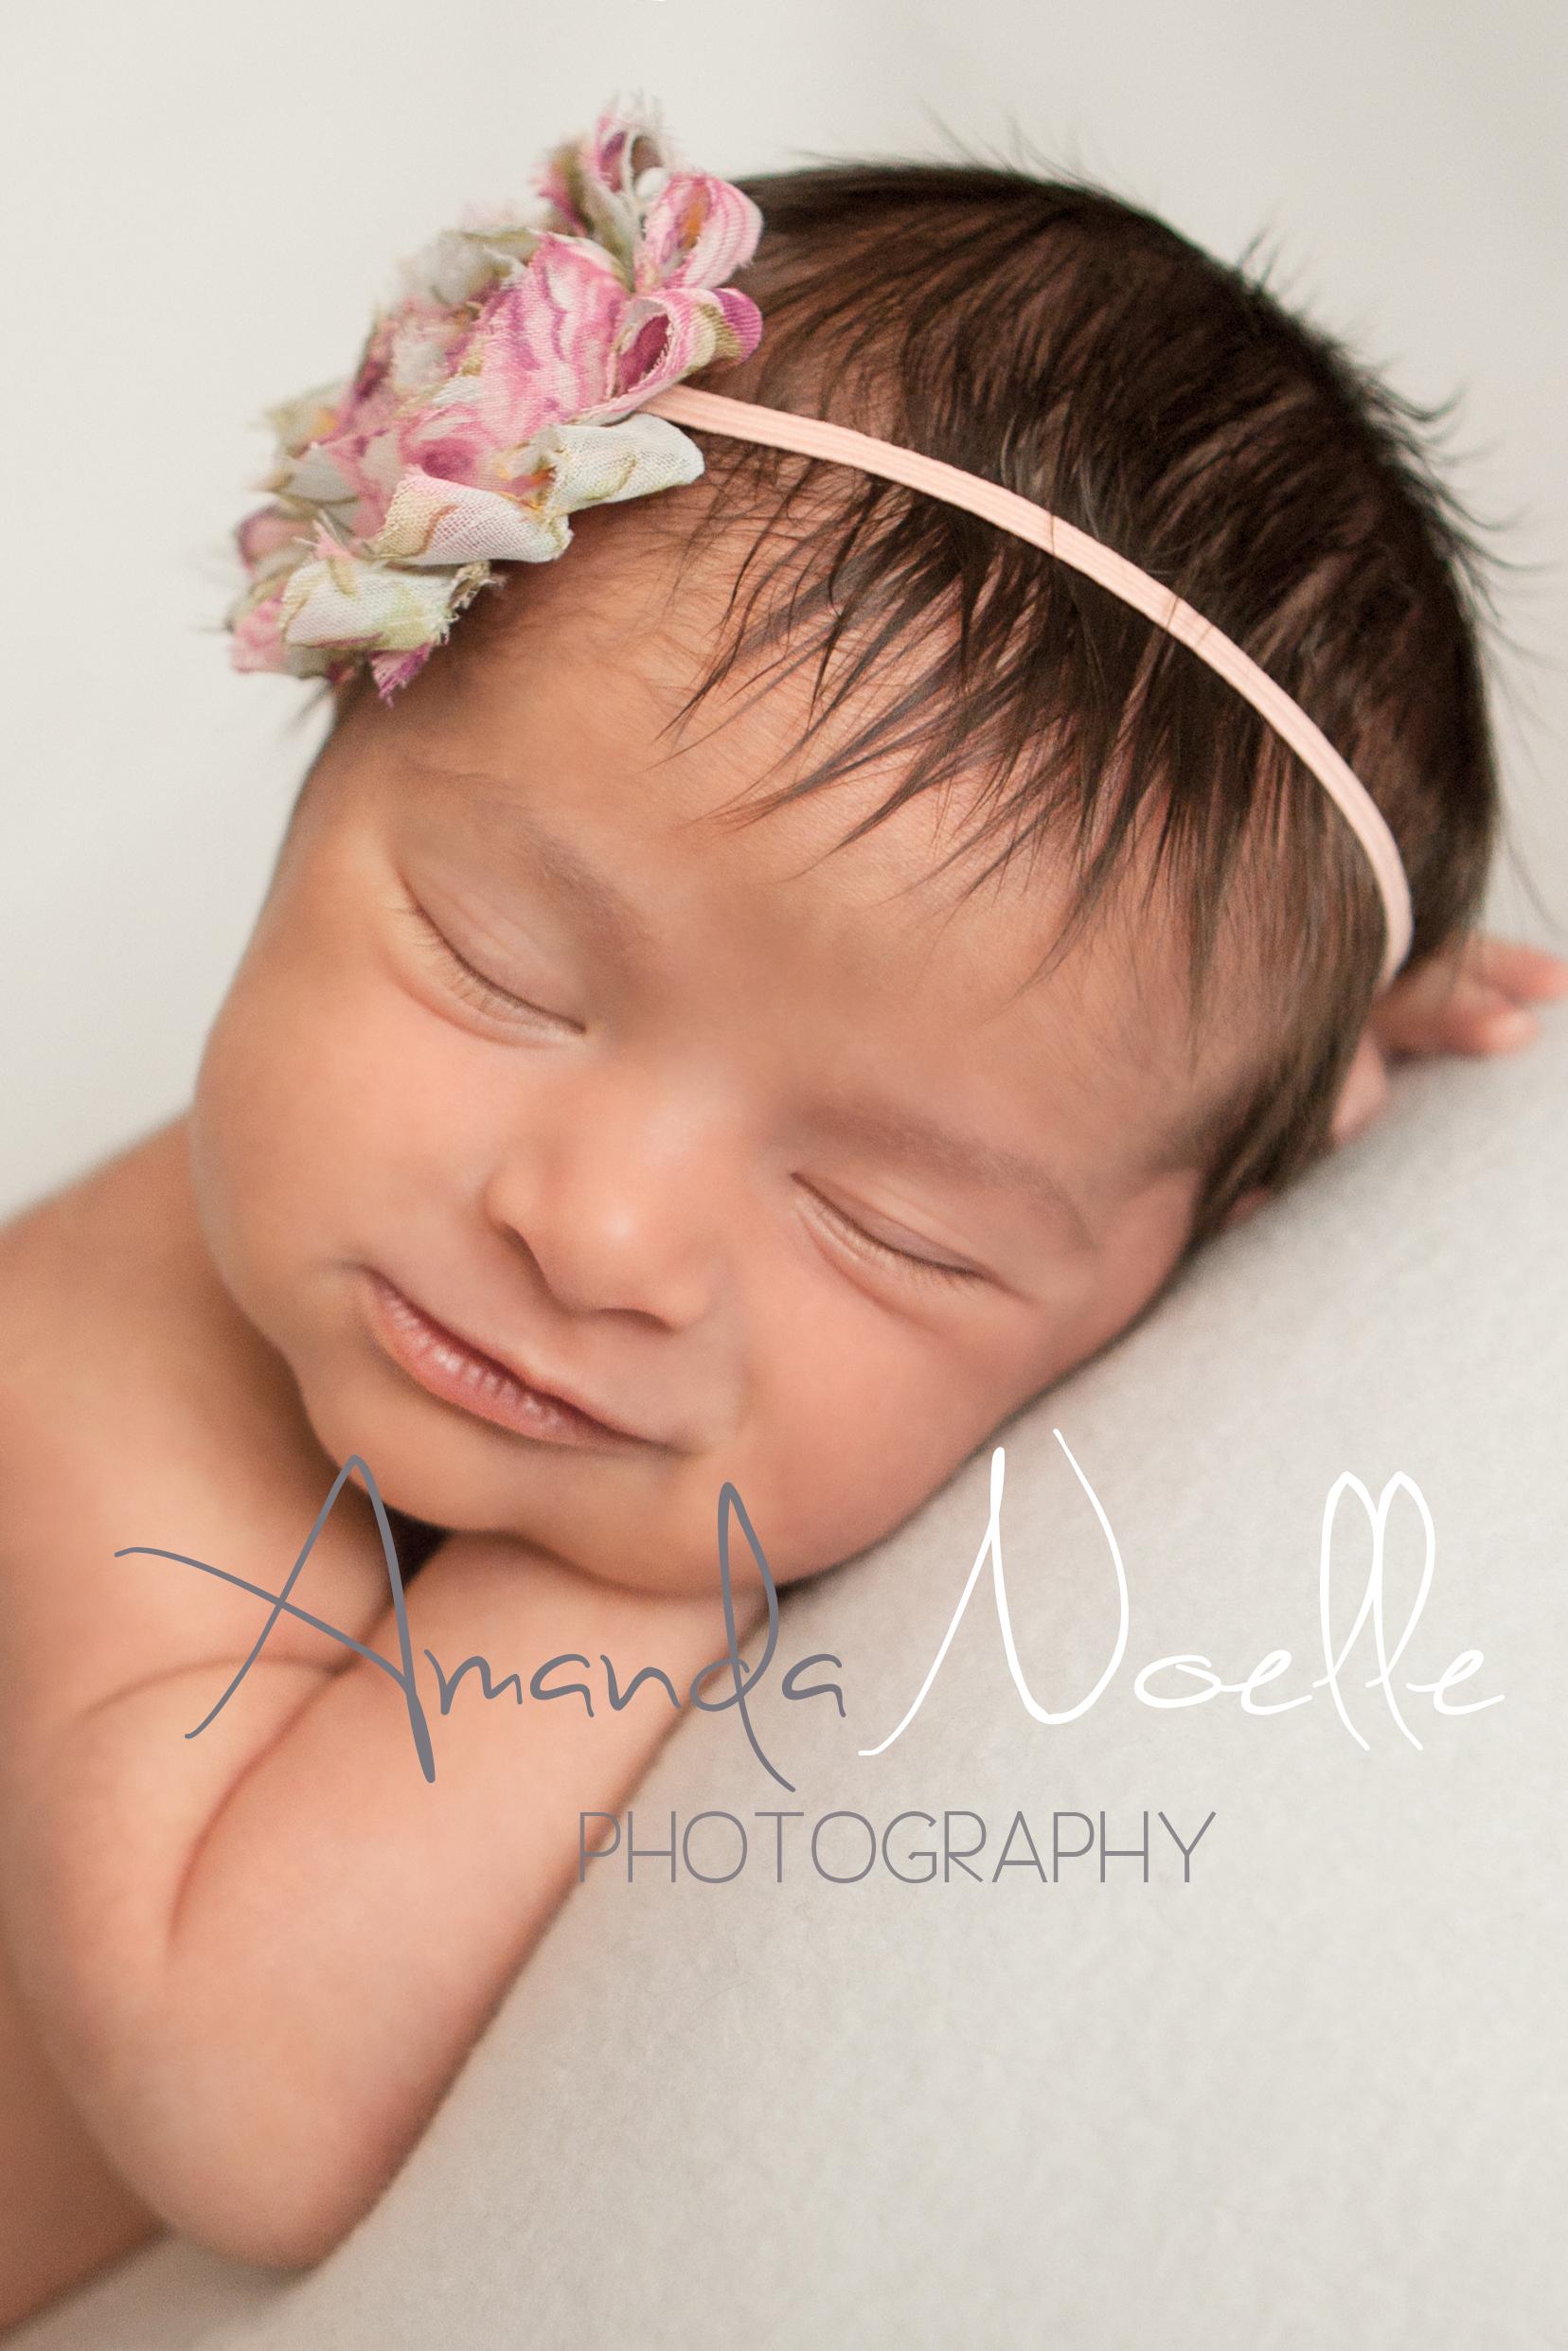 Newborn baby girl sleeping smile with shabby chic pinkheadband on white fabric backdrop, beanbag pose, Westchester, County New York Newborn Photographer, Amanda Noelle Photography.